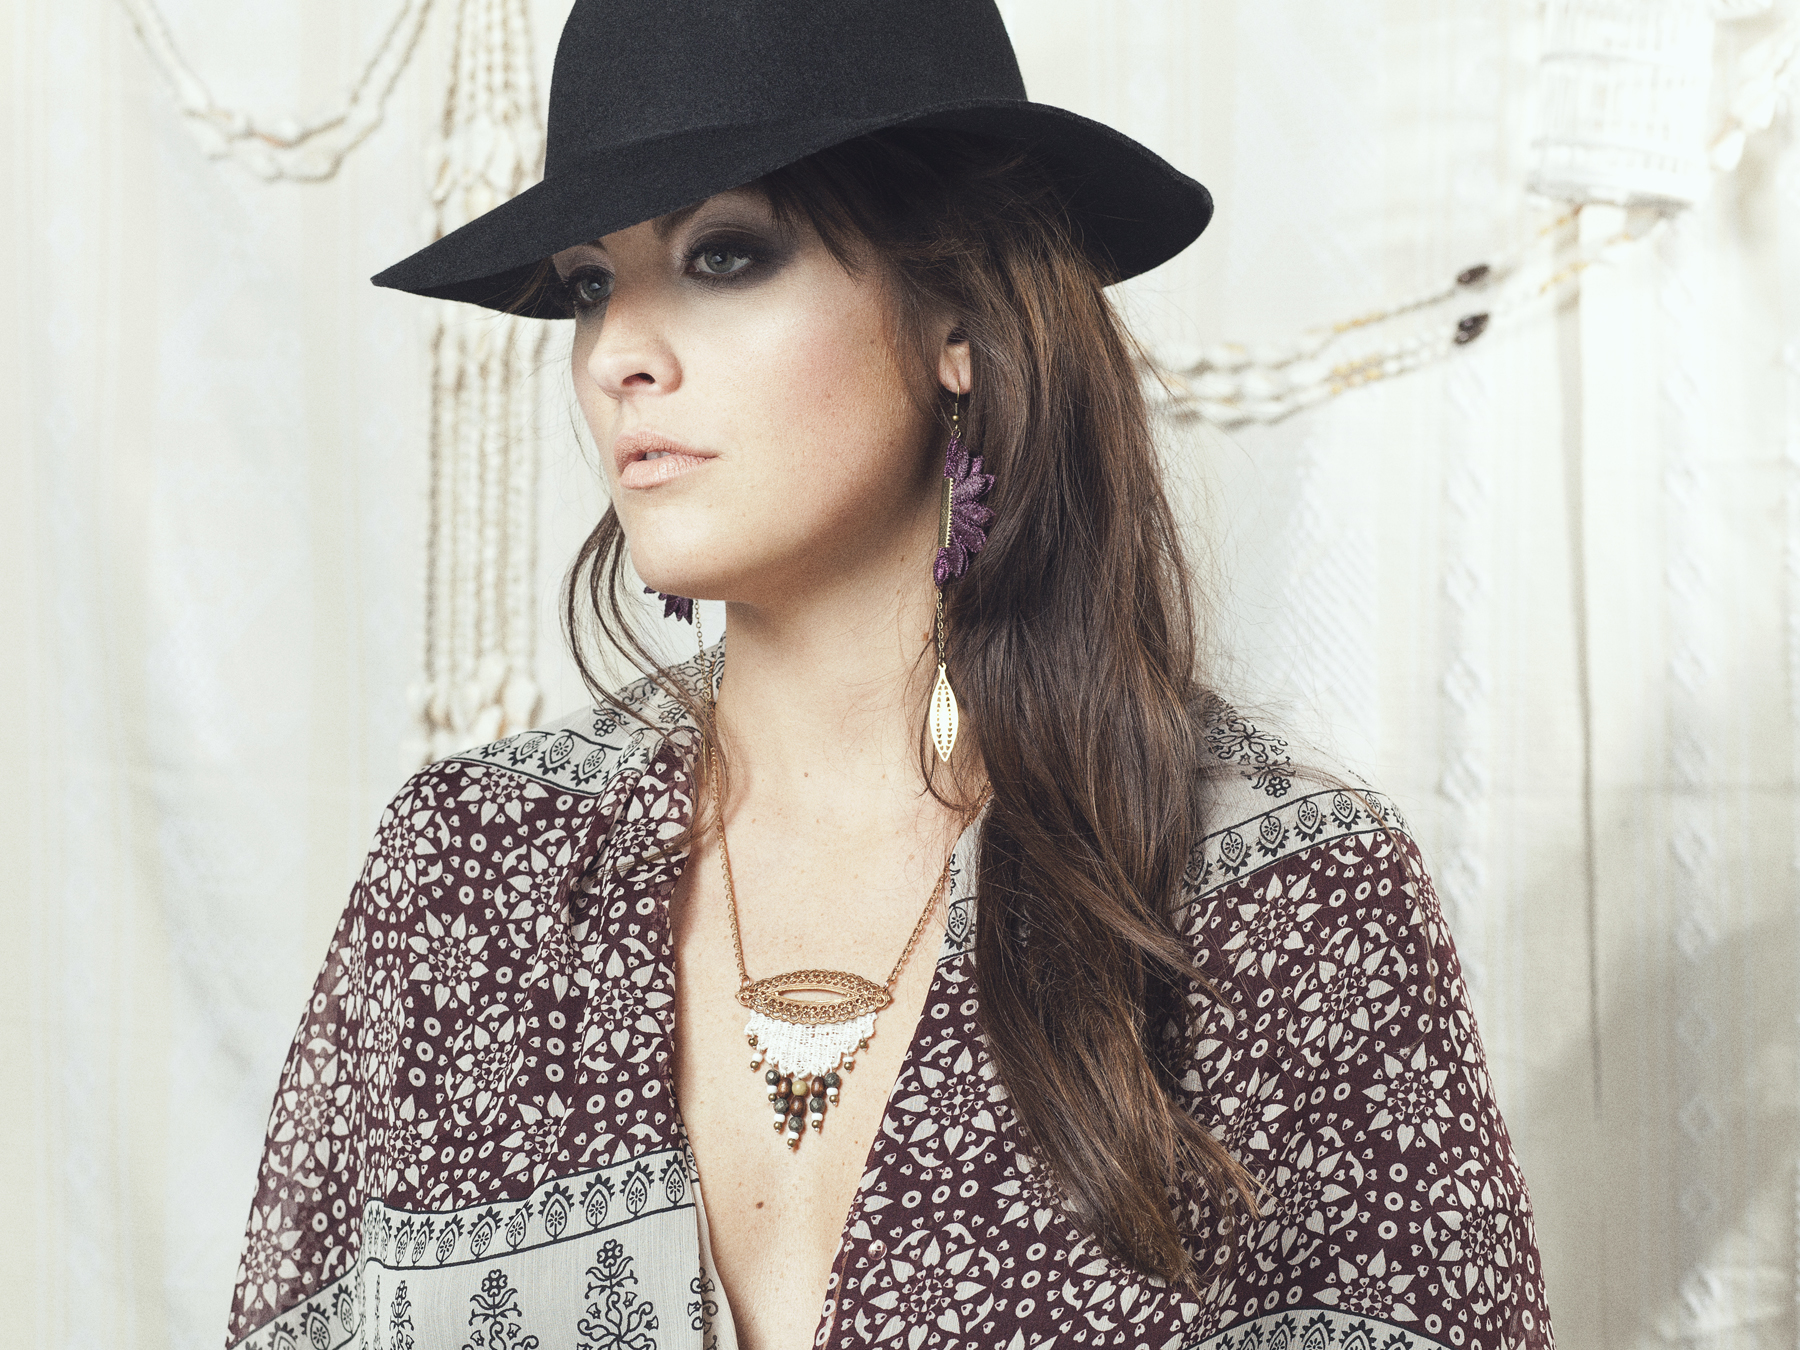 Pendulum earrings (details here) +  Hamsa necklace (details here)